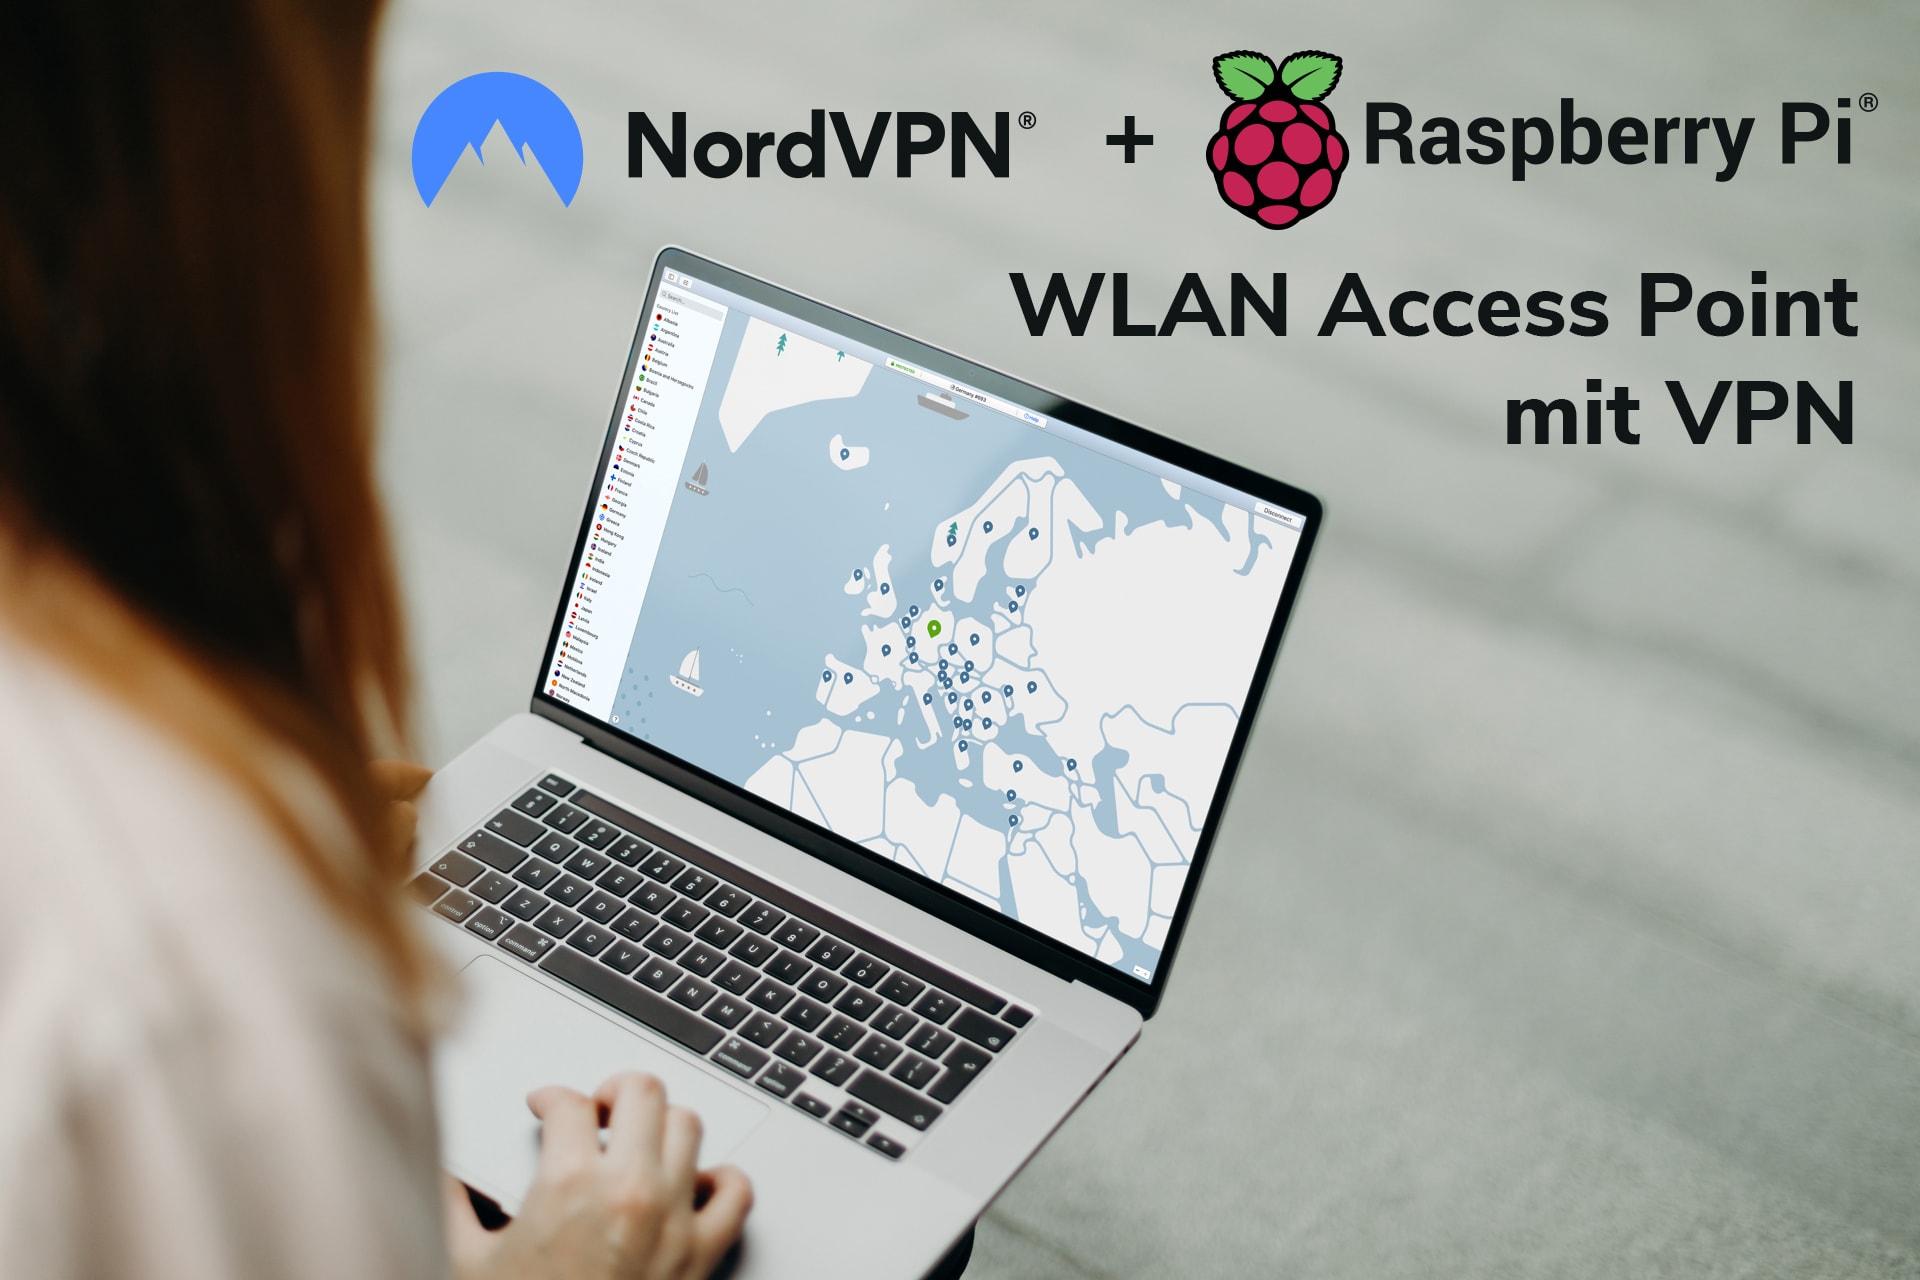 Raspberry Pi: WLAN Access Point Mit NordVPN (VPN Router)